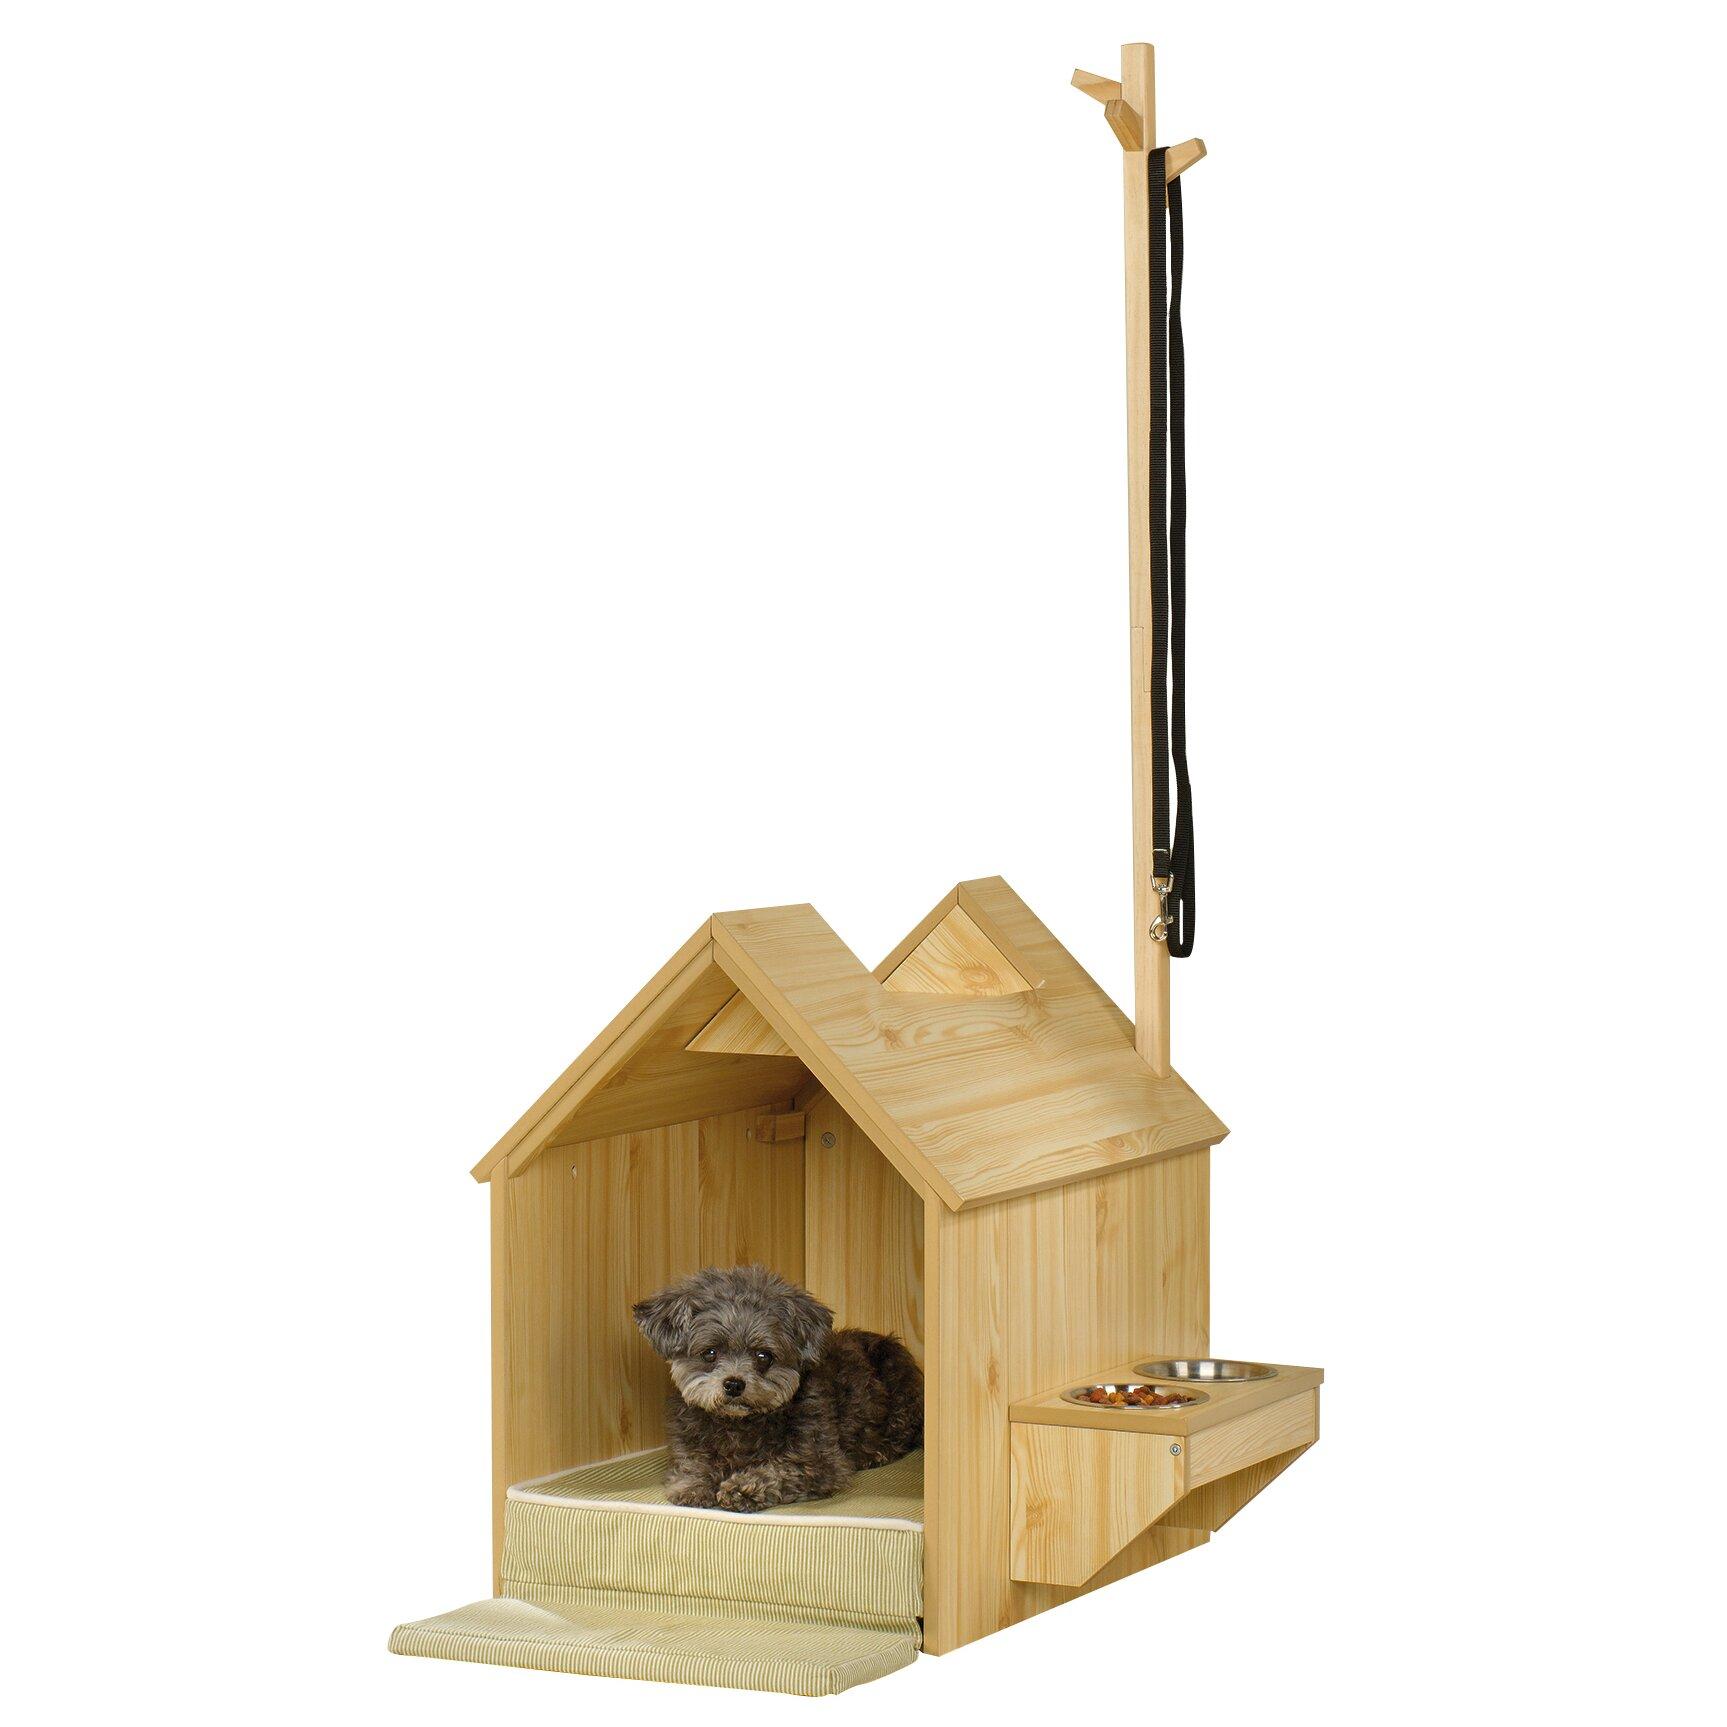 Indoor dog house - Indoor Dog House